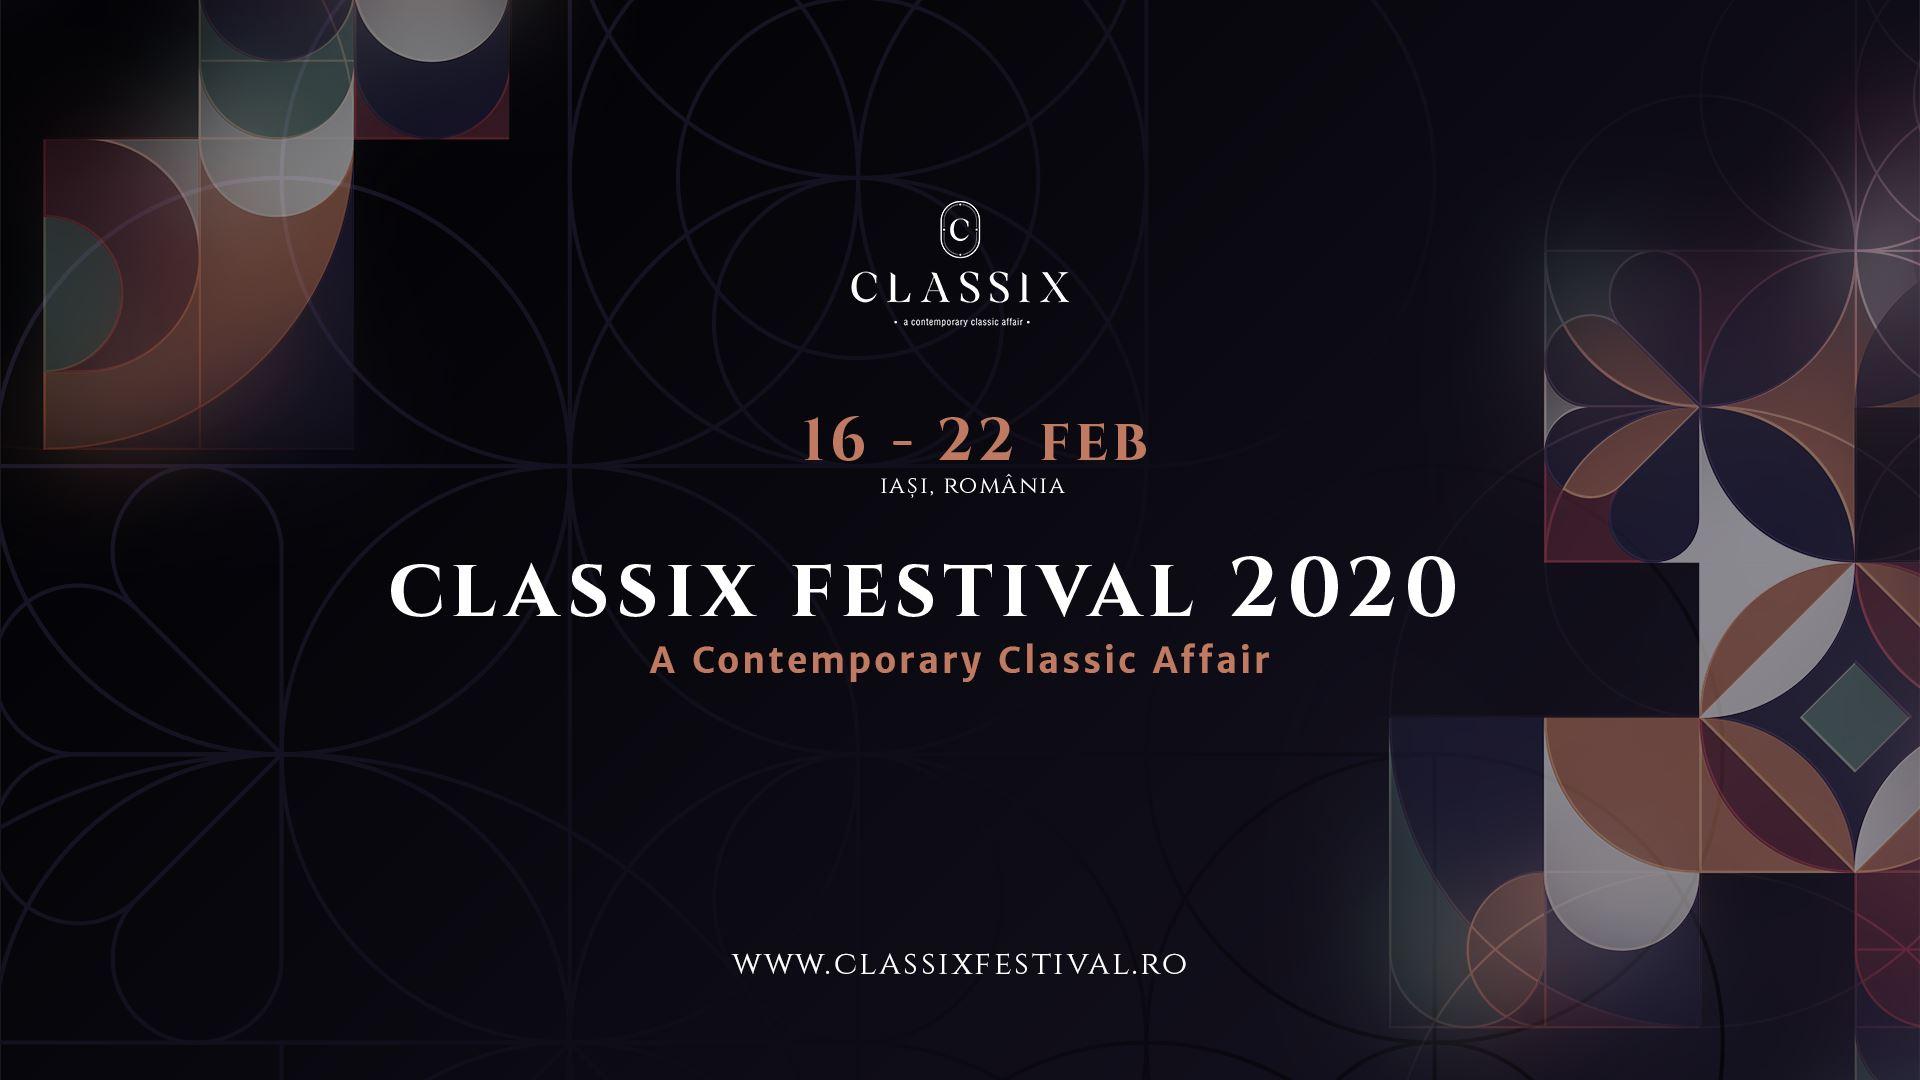 Classix Festival 2020